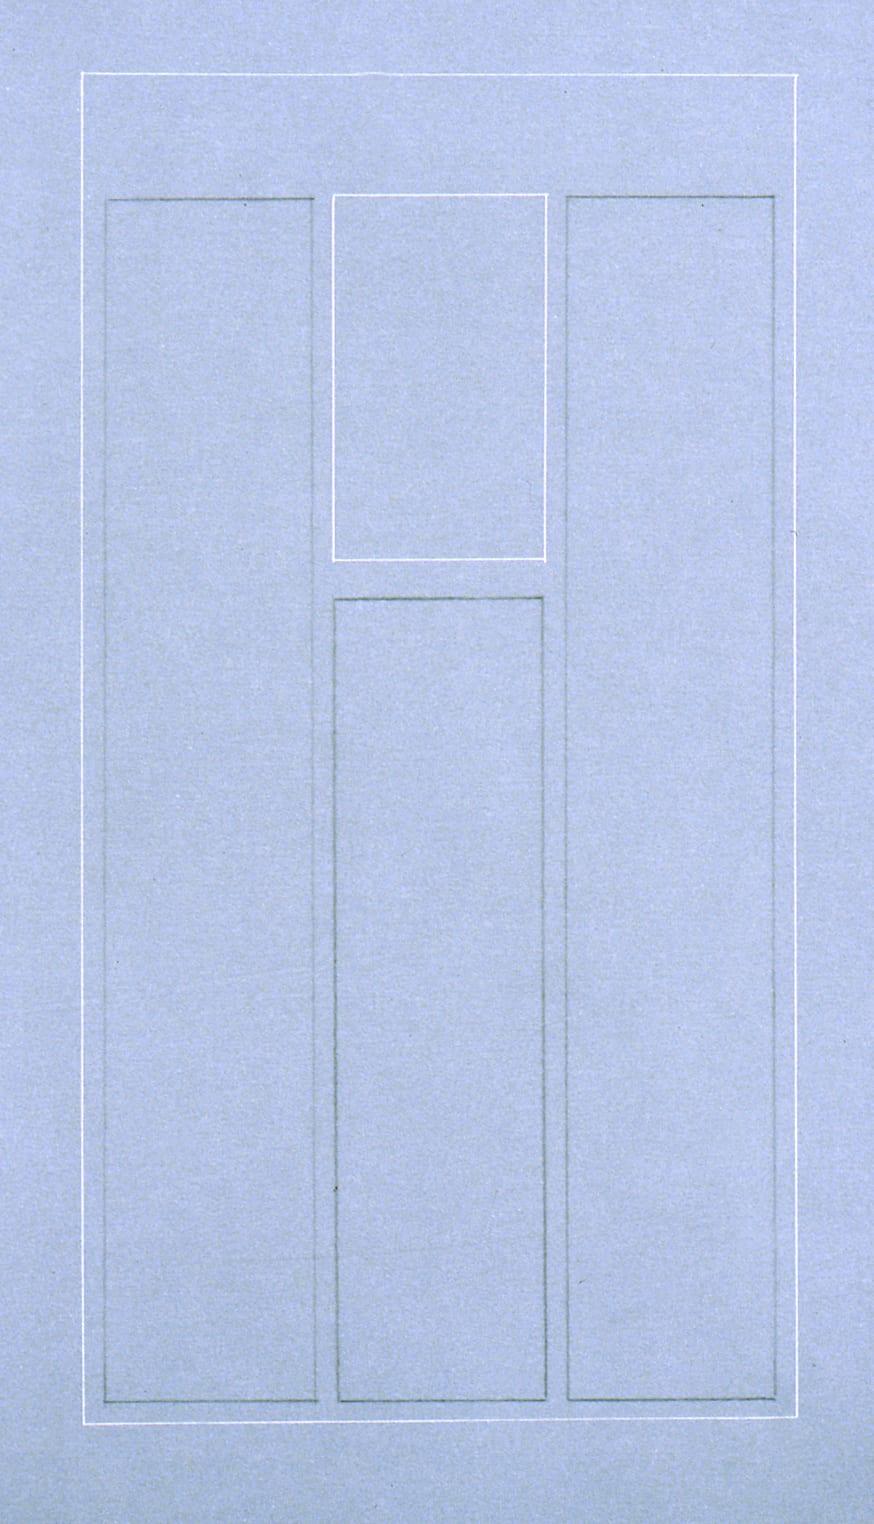 Karen L. Schiff, Agnes Martin, El País, 21 December 2004, II, 2005, graphite and stylus on vellum, 17 x 12 inches (artwork © Karen L. Schiff)